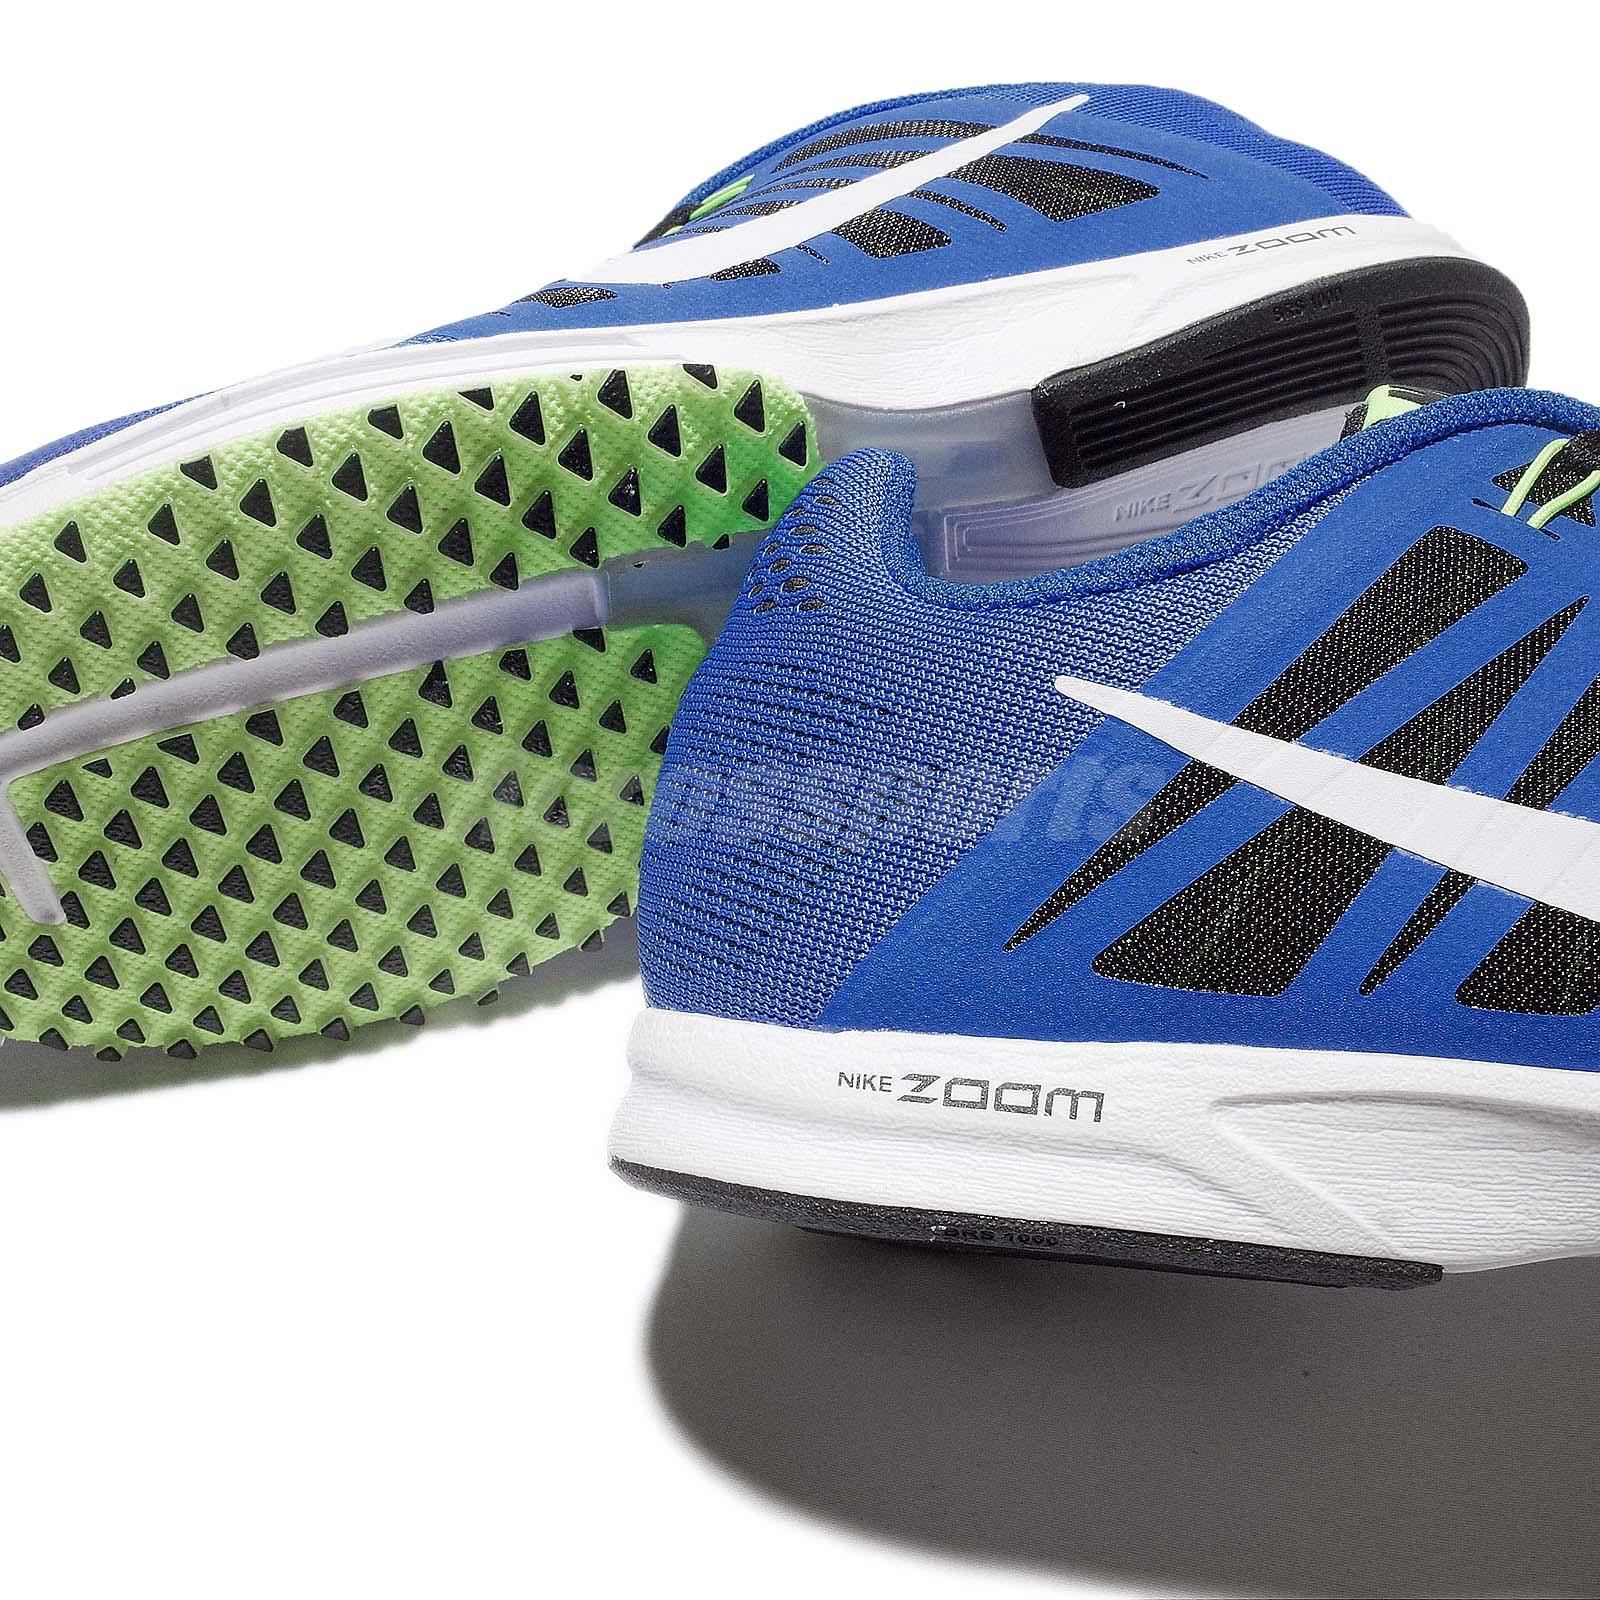 68b3dedbe17ac Nike Air Zoom Speed Racer 6 синий белый зеленый мужской гоночный ...